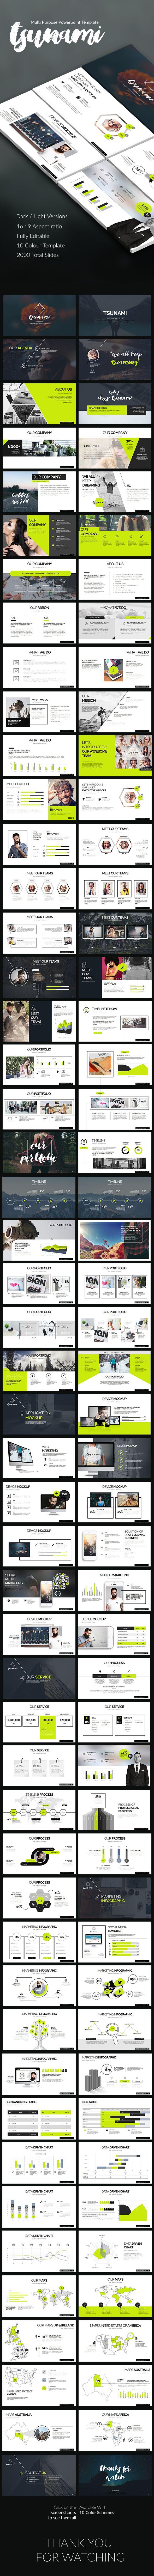 Tsunami Powerpoint Presentation #creative #magazine • Download ➝ https://graphicriver.net/item/tsunami-powerpoint-presentation/18223050?ref=pxcr